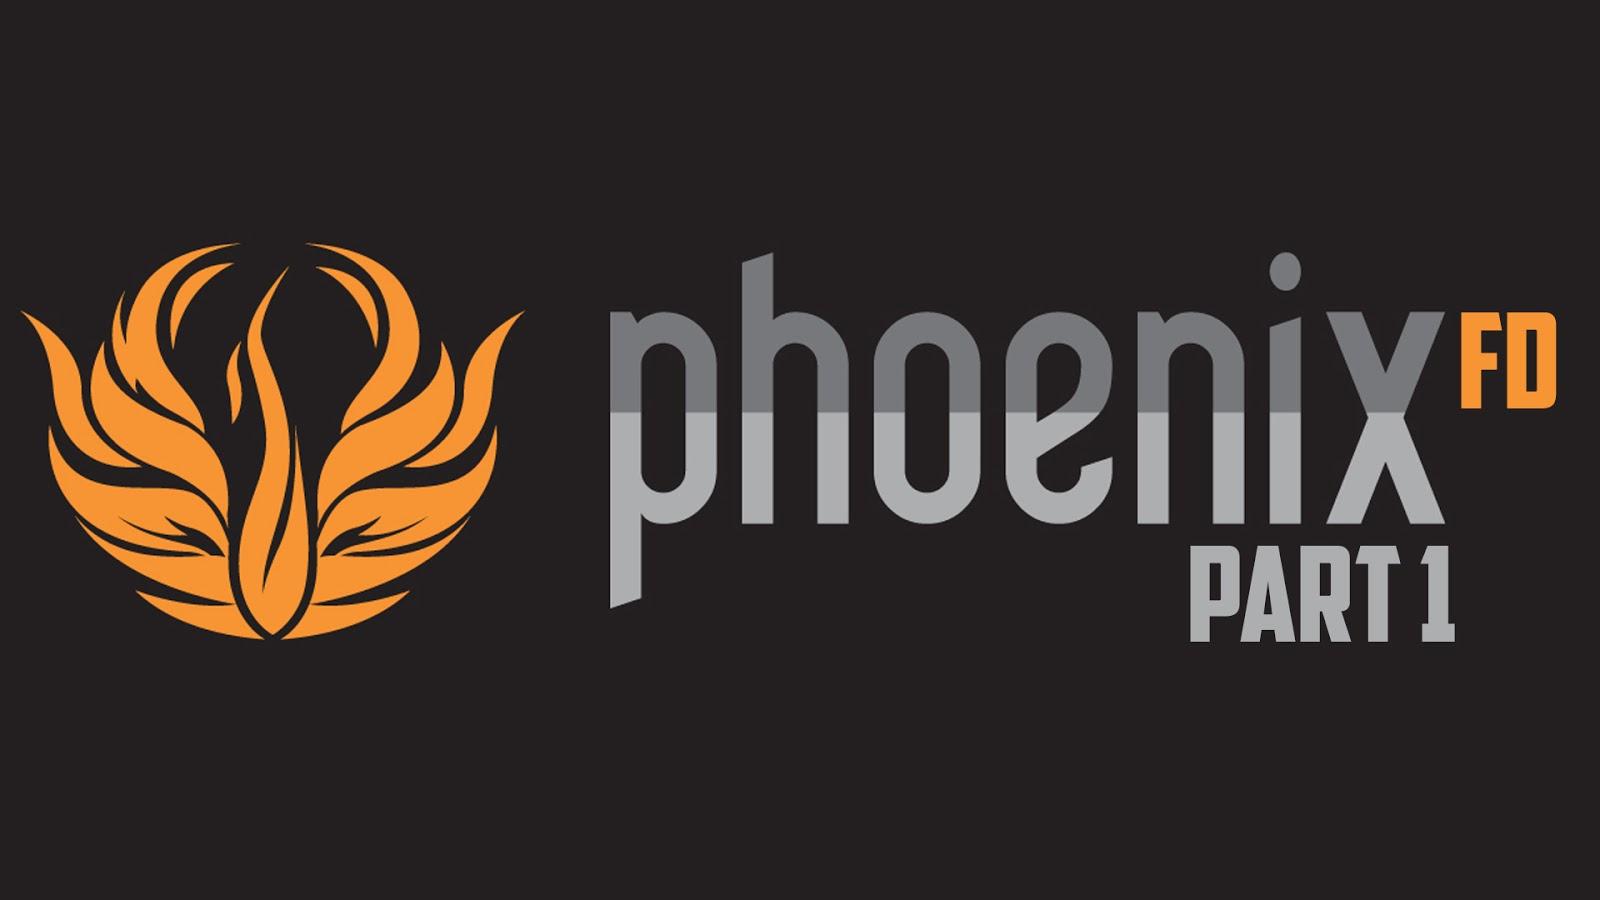 PHOENIXFD_PART1.jpg